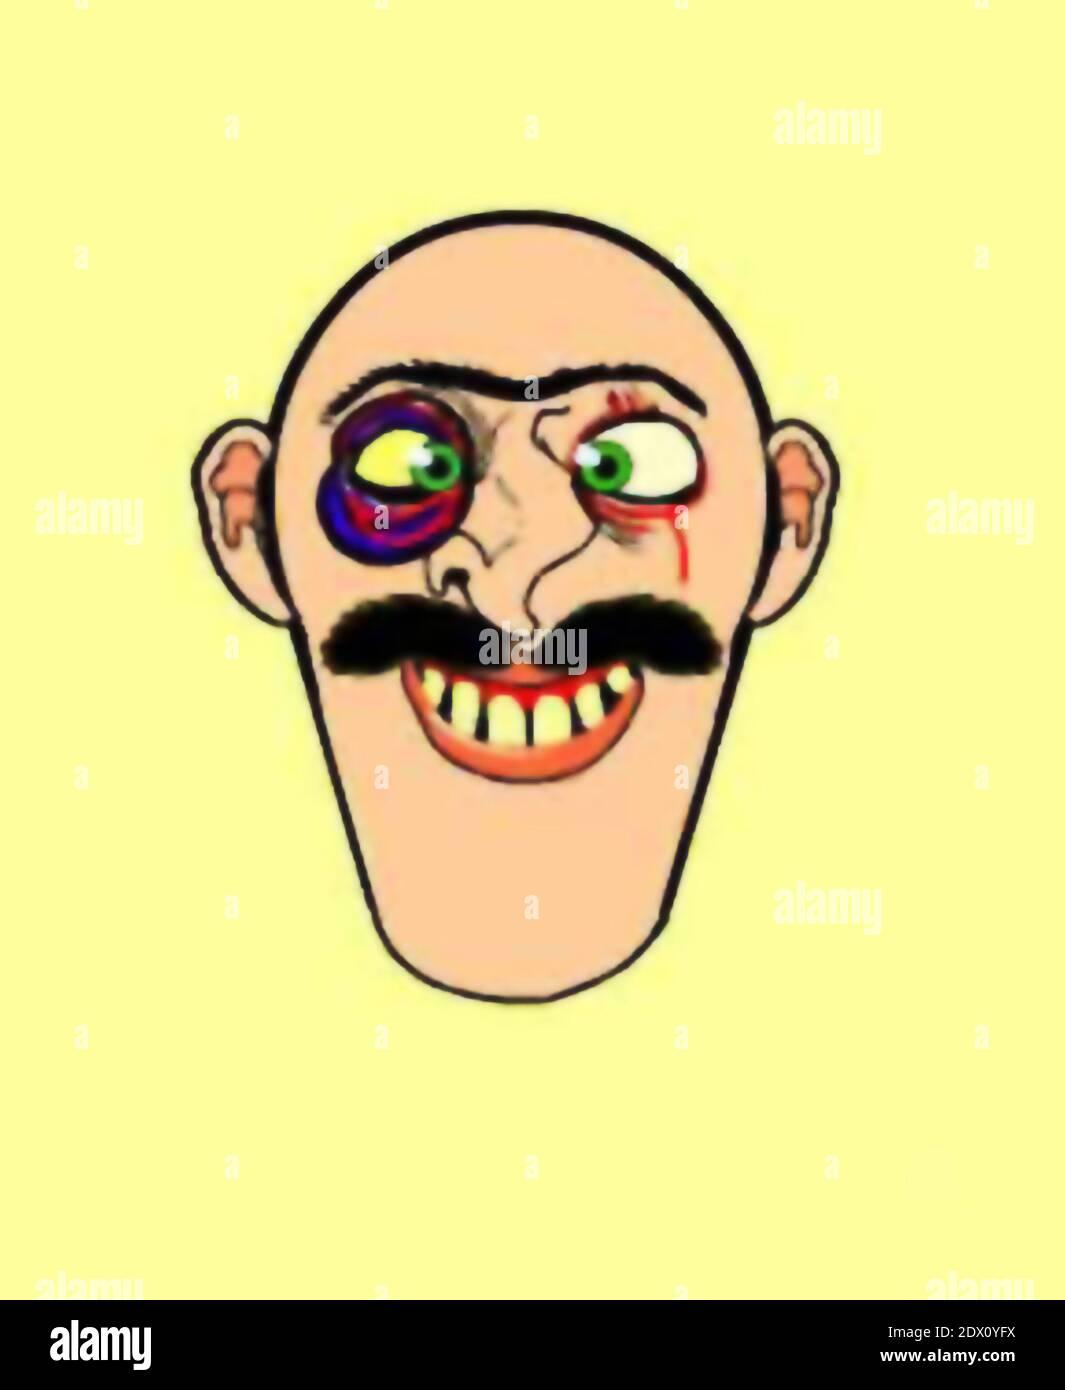 Bruised Eye Vector Images (79) - VectorStock